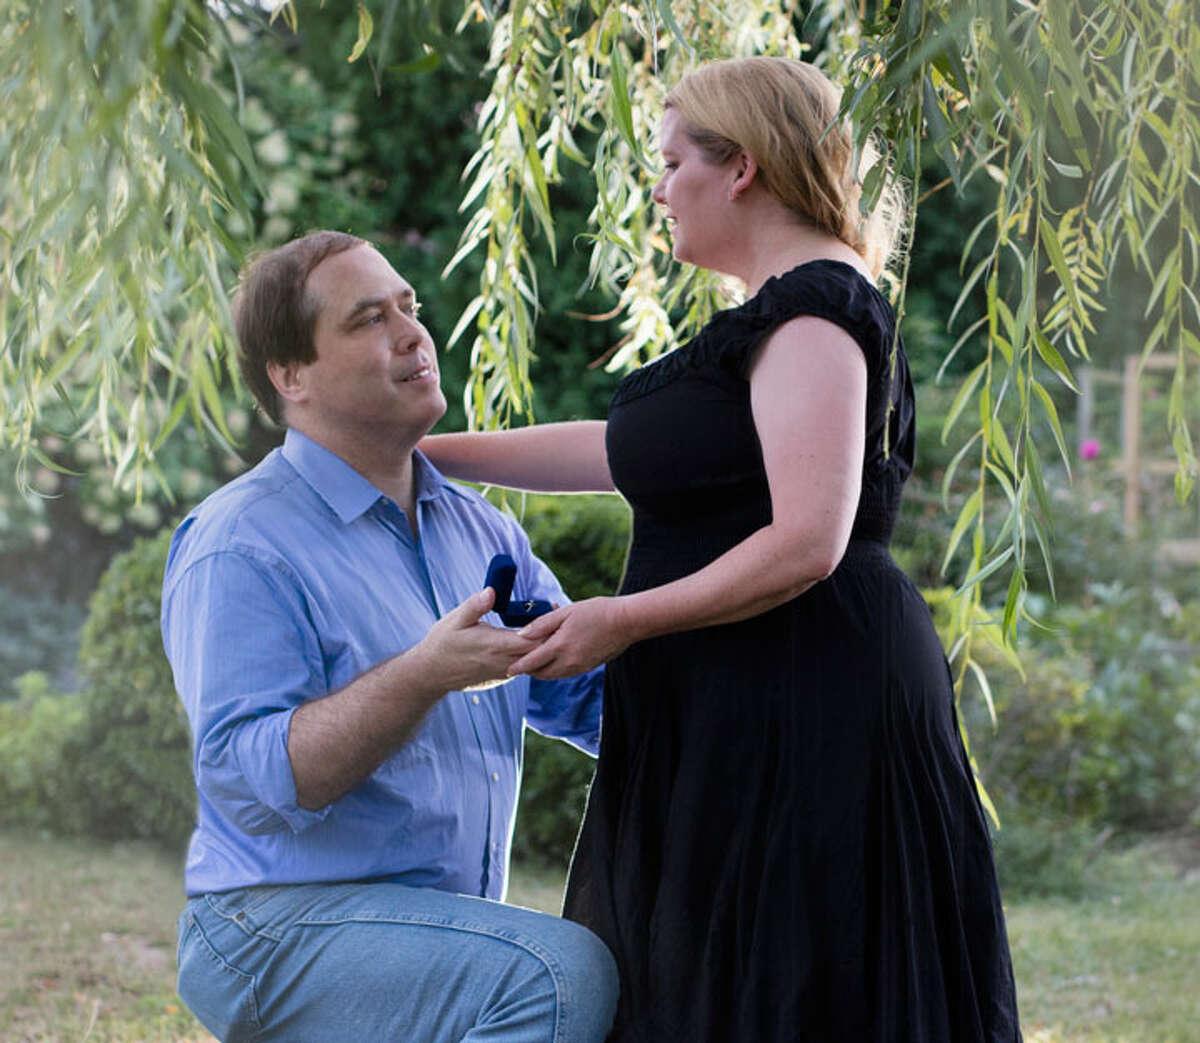 Catherine Fiehn Malat and Eric LeStrange